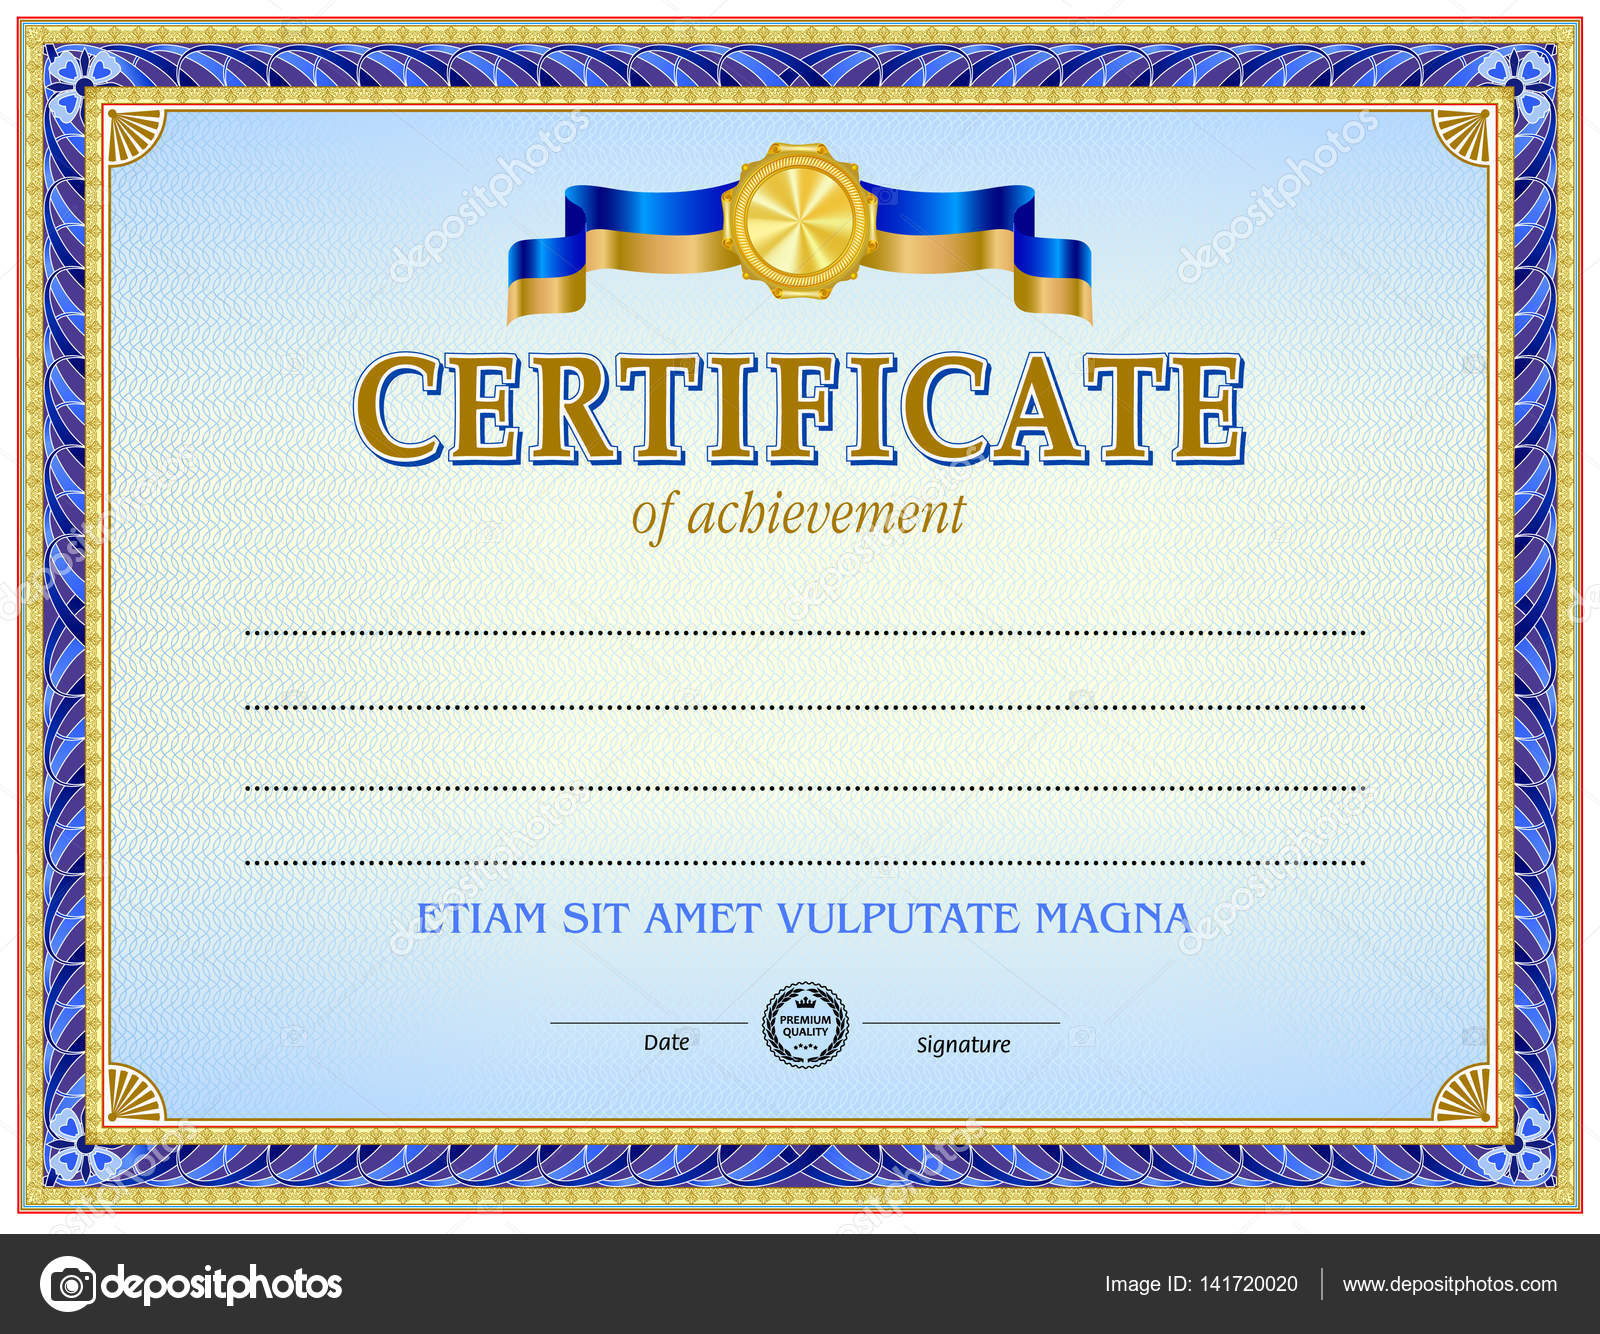 Zertifikat leere Vorlage — Stockvektor © tedgun #141720020